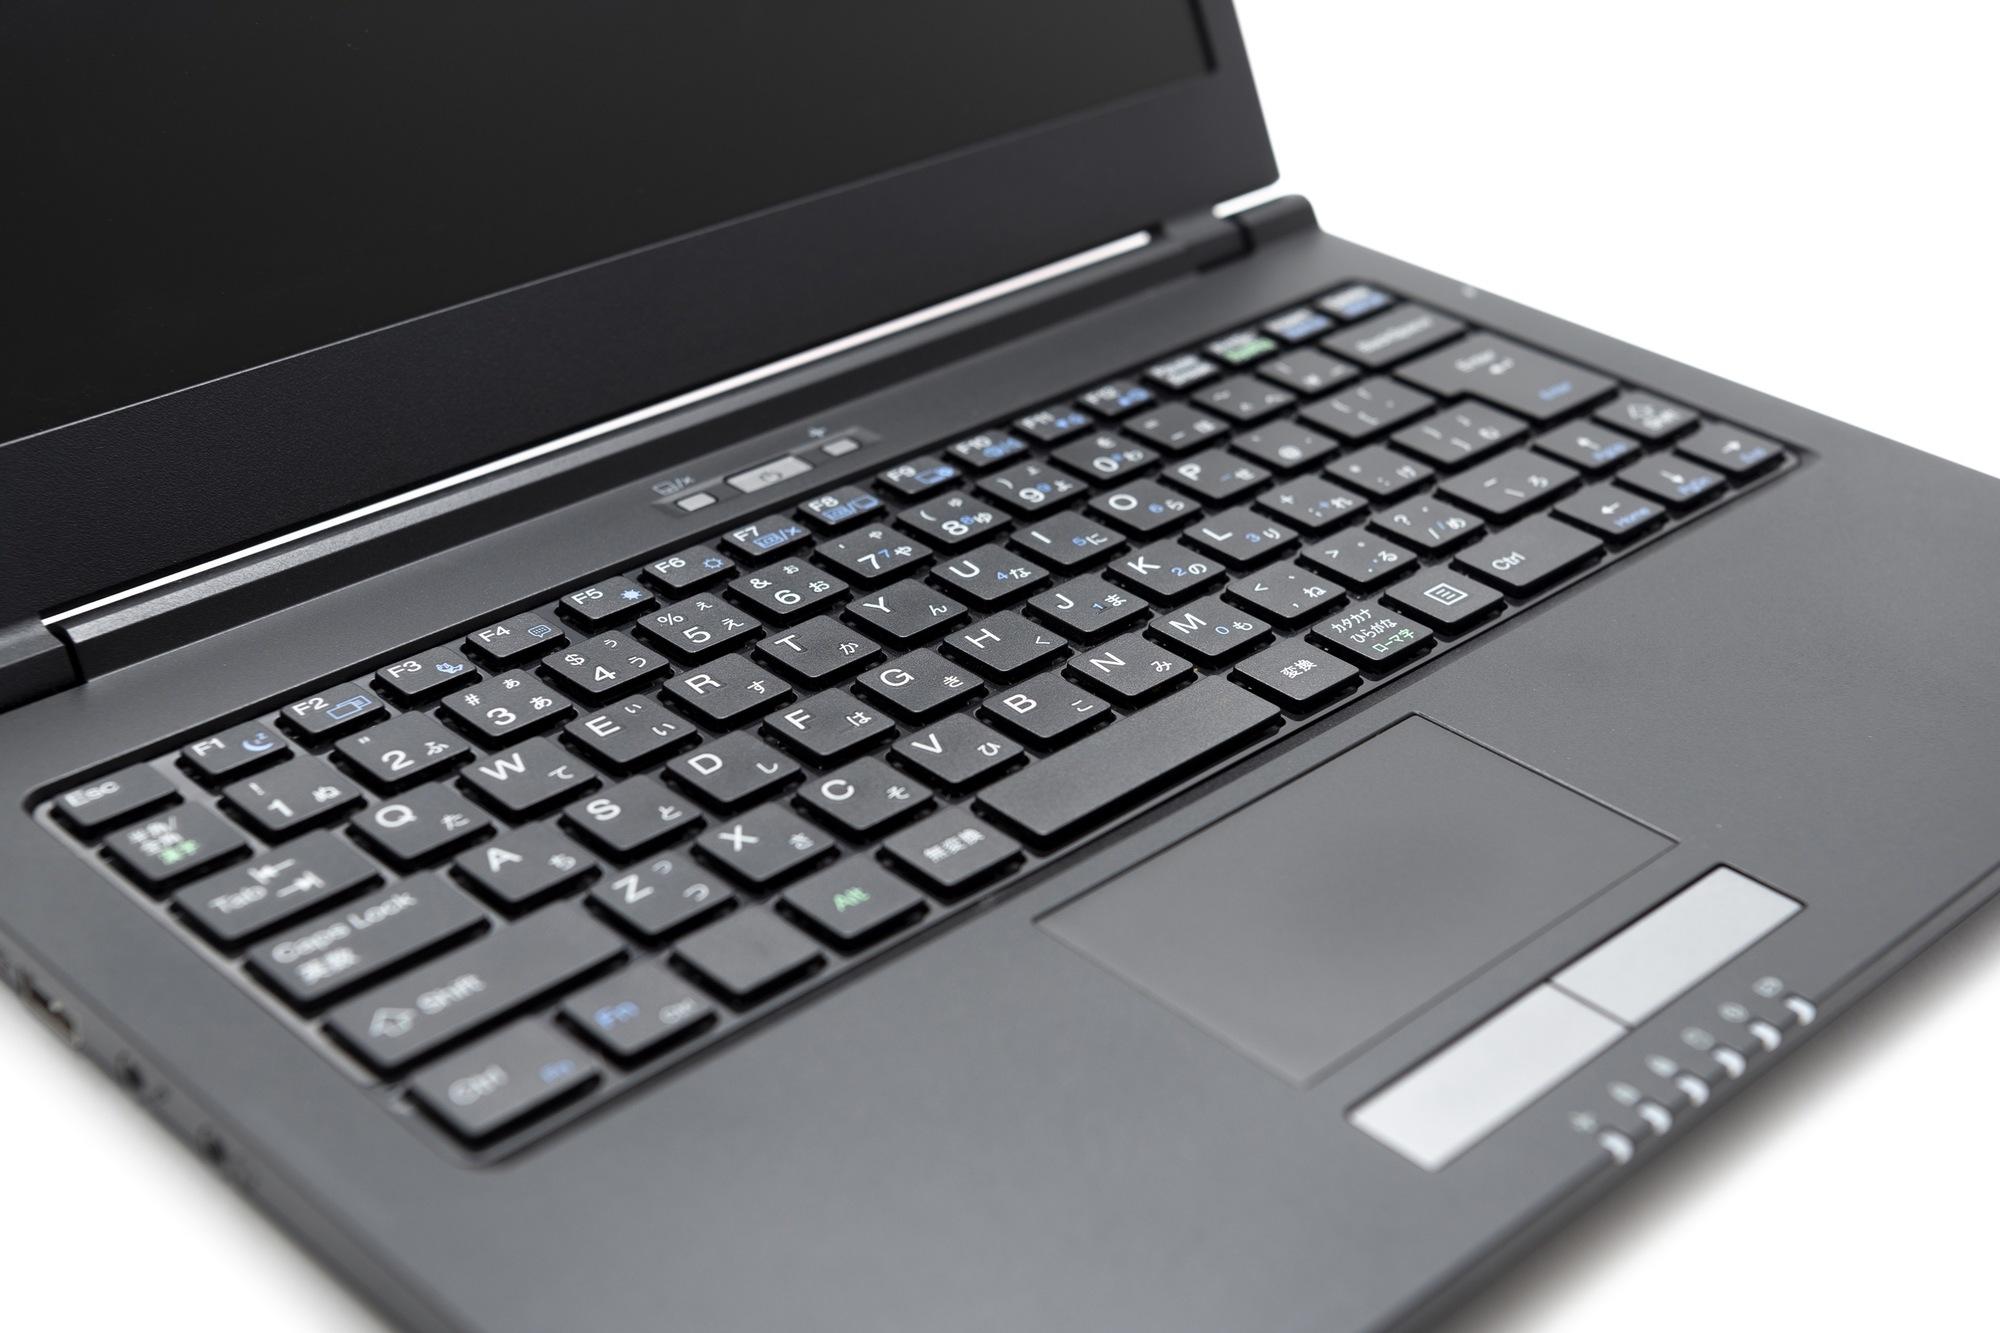 NO55・Windowsのパソコンが勝手に再起動する原因と対処法を解説